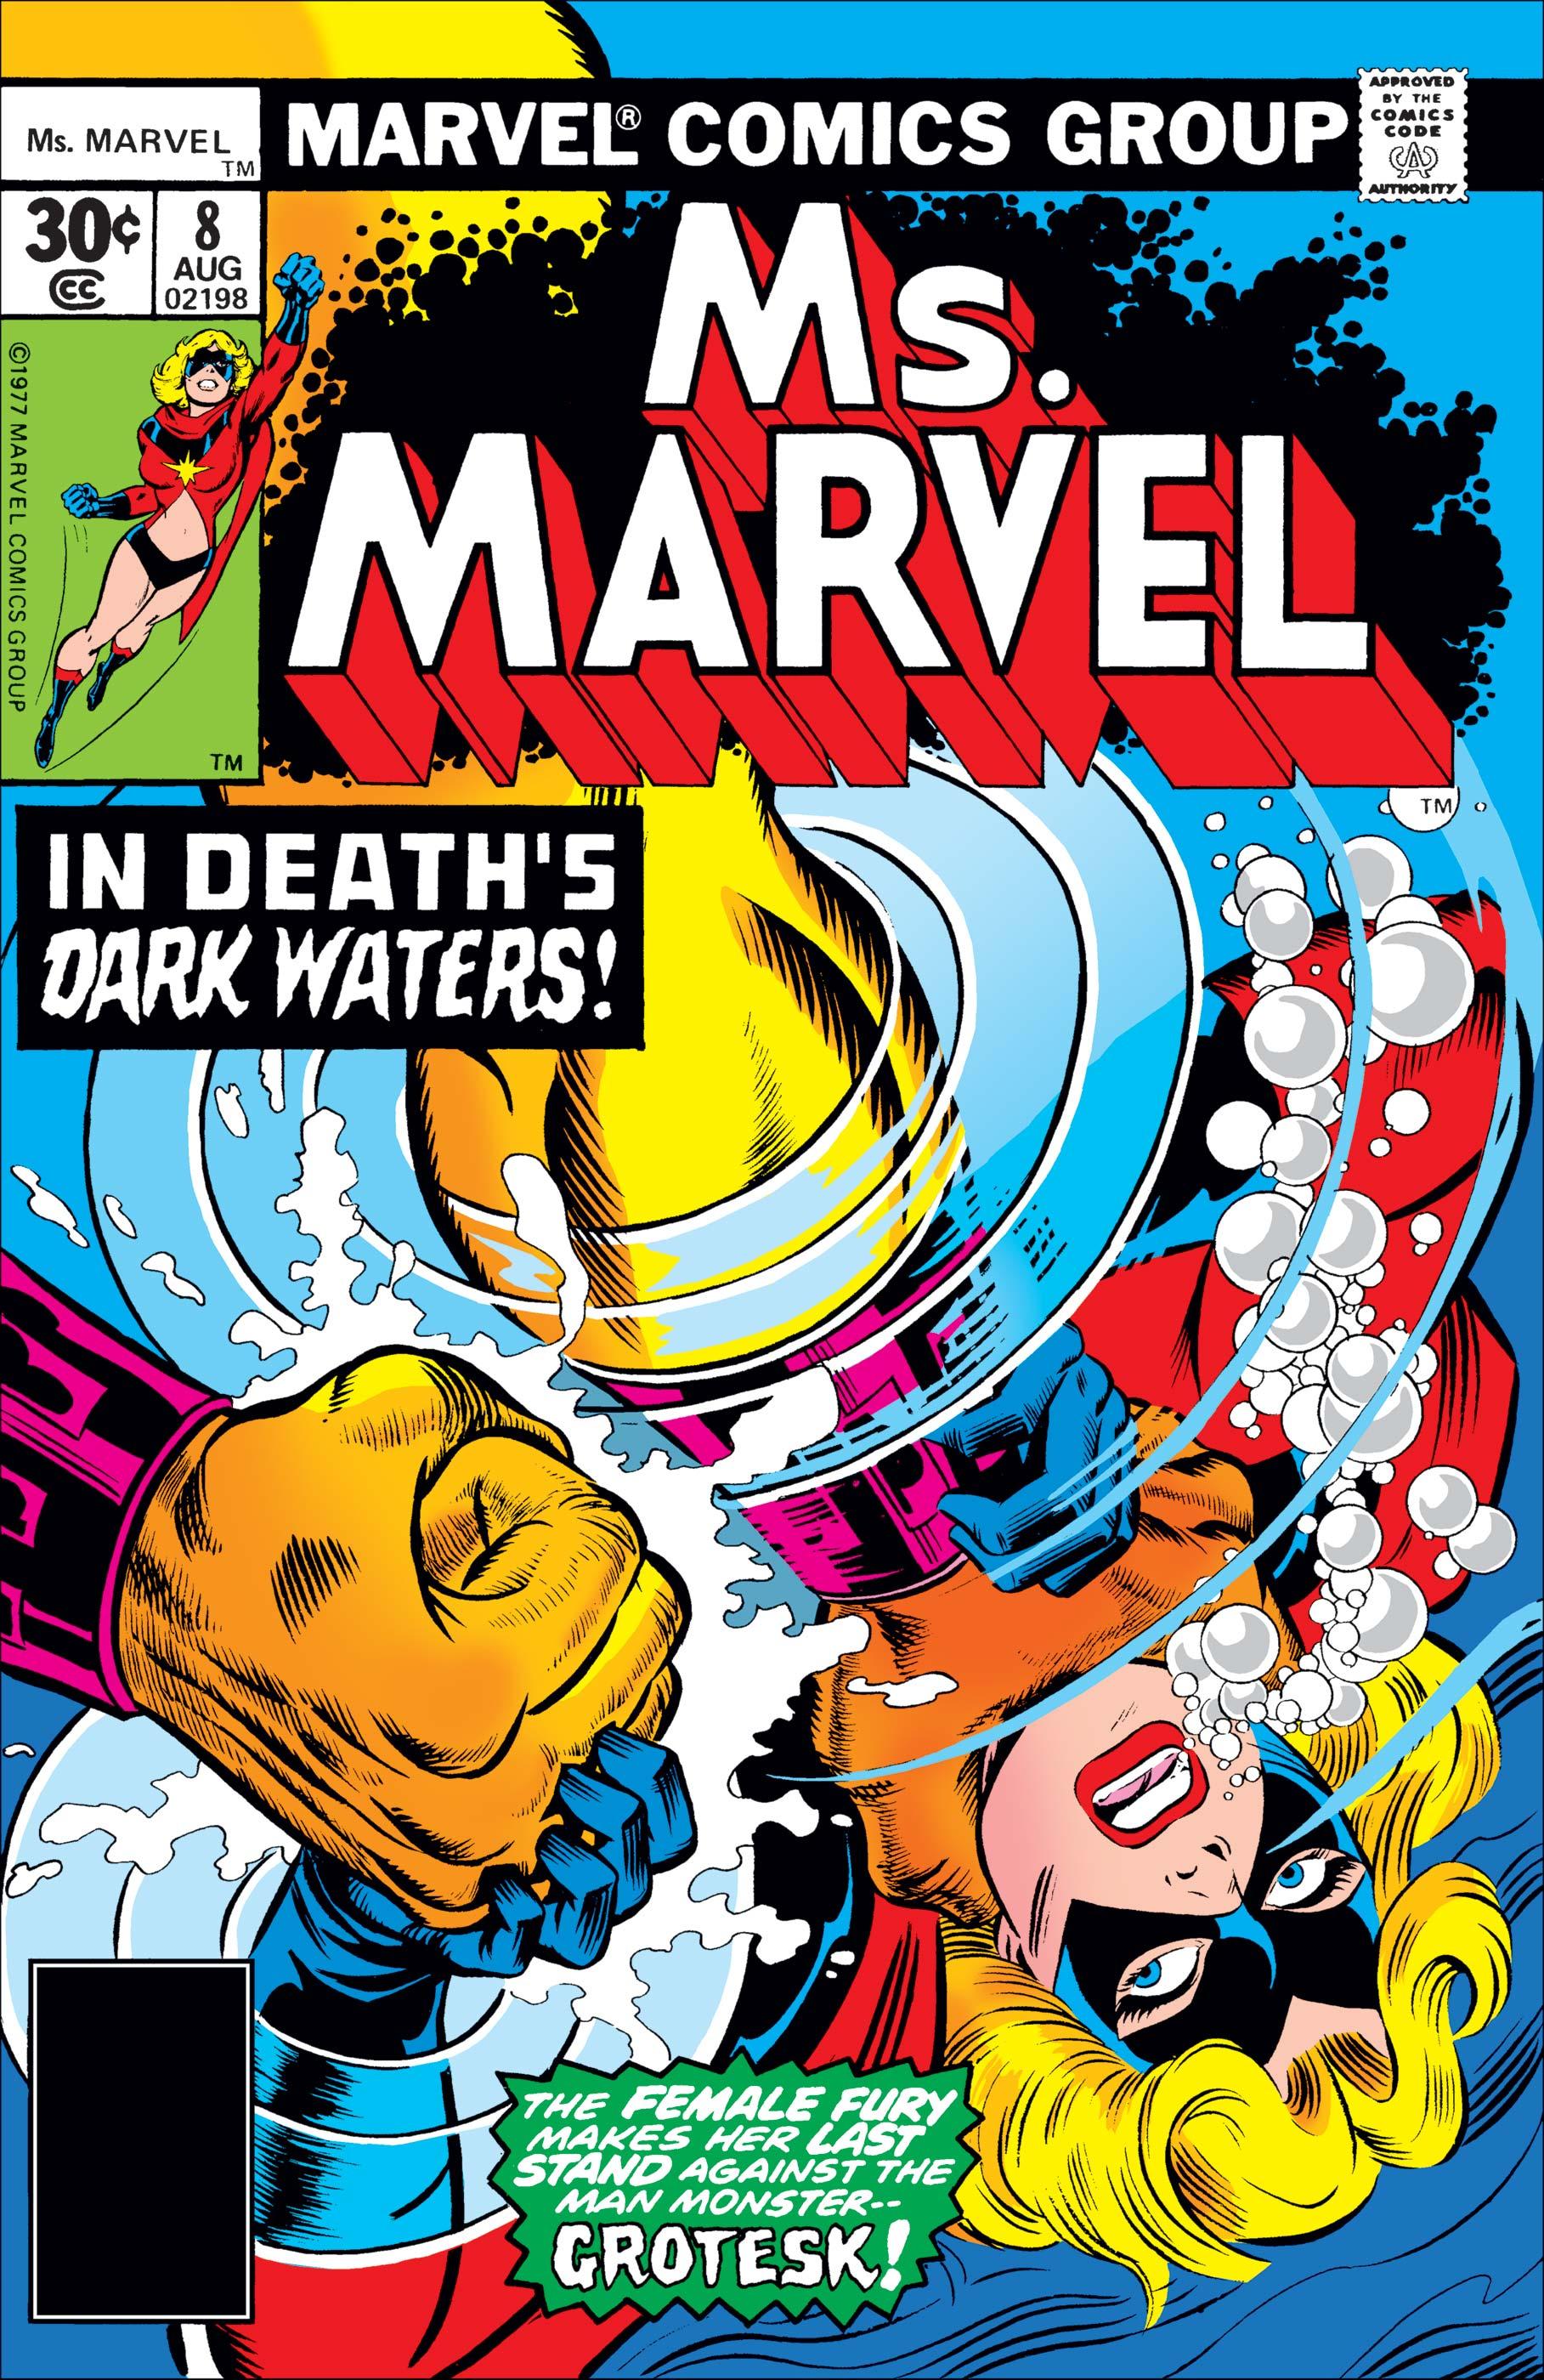 Ms. Marvel (1977) #8